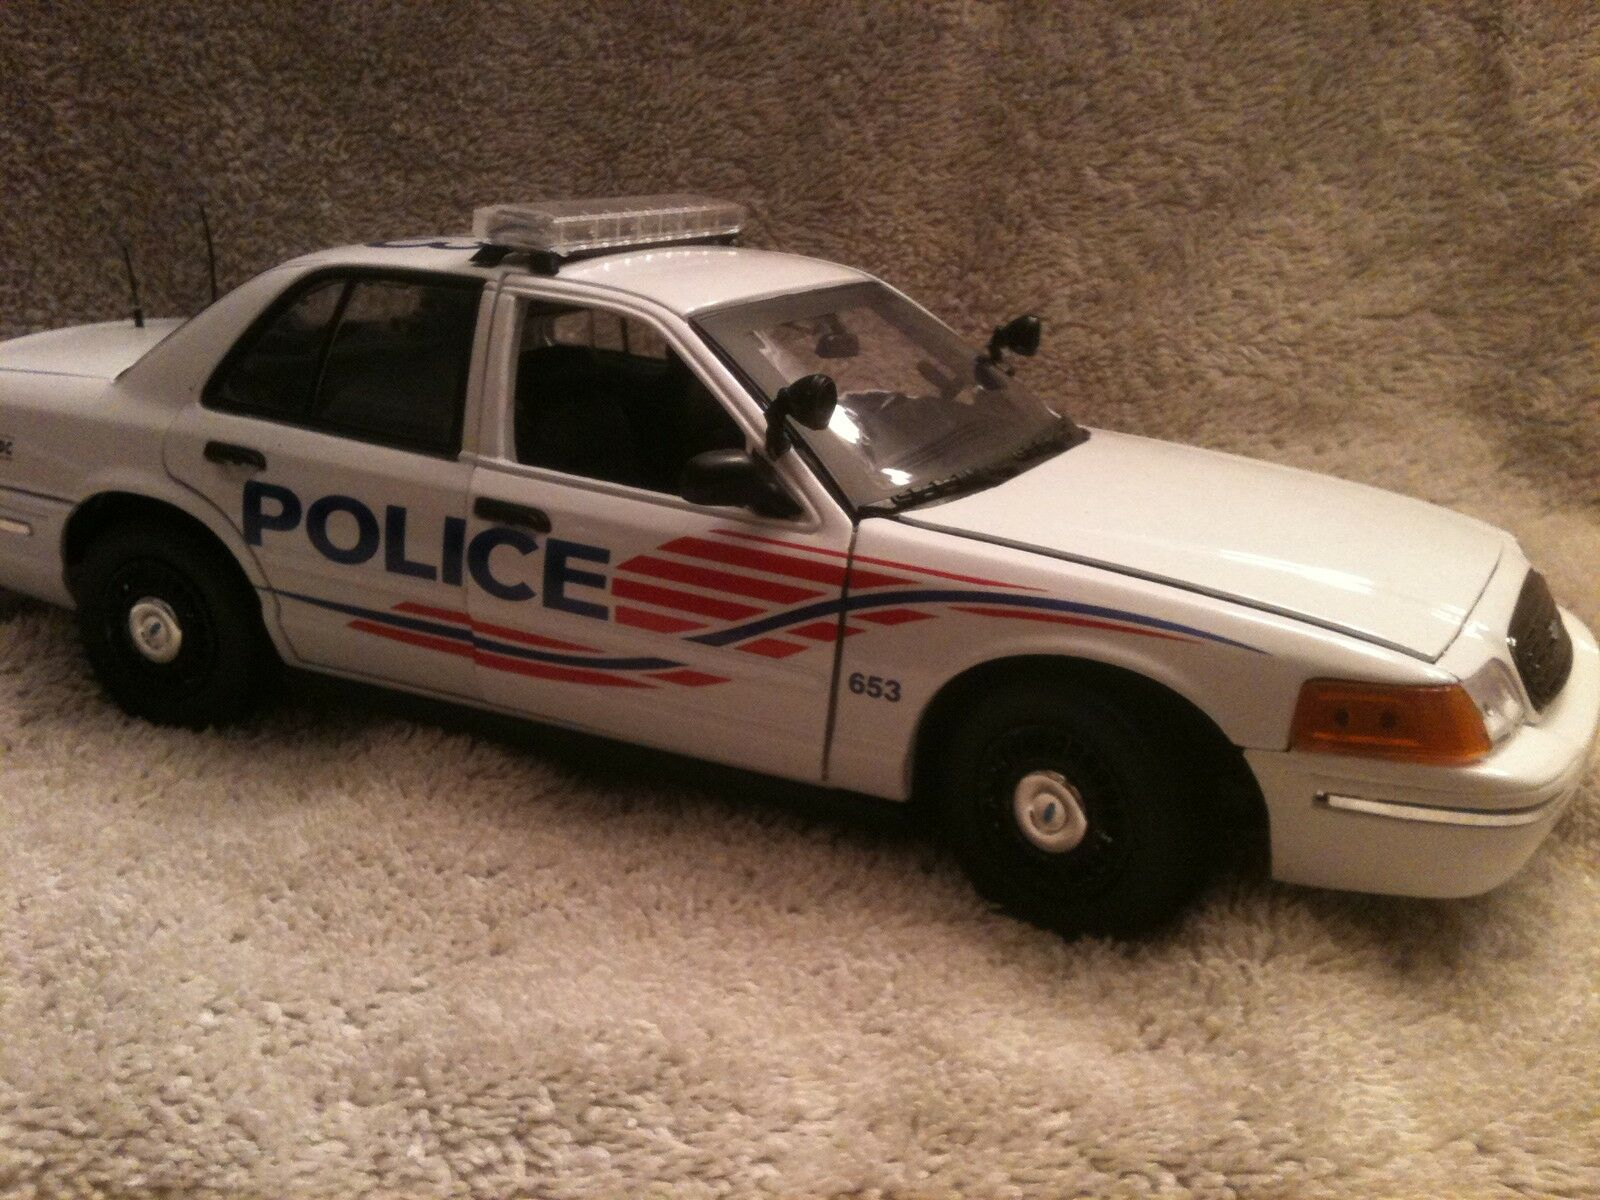 WASHINGTON DC METRO POLICE UT DIECAST MODEL  WITH WORKING LIGHTS AND SIREN